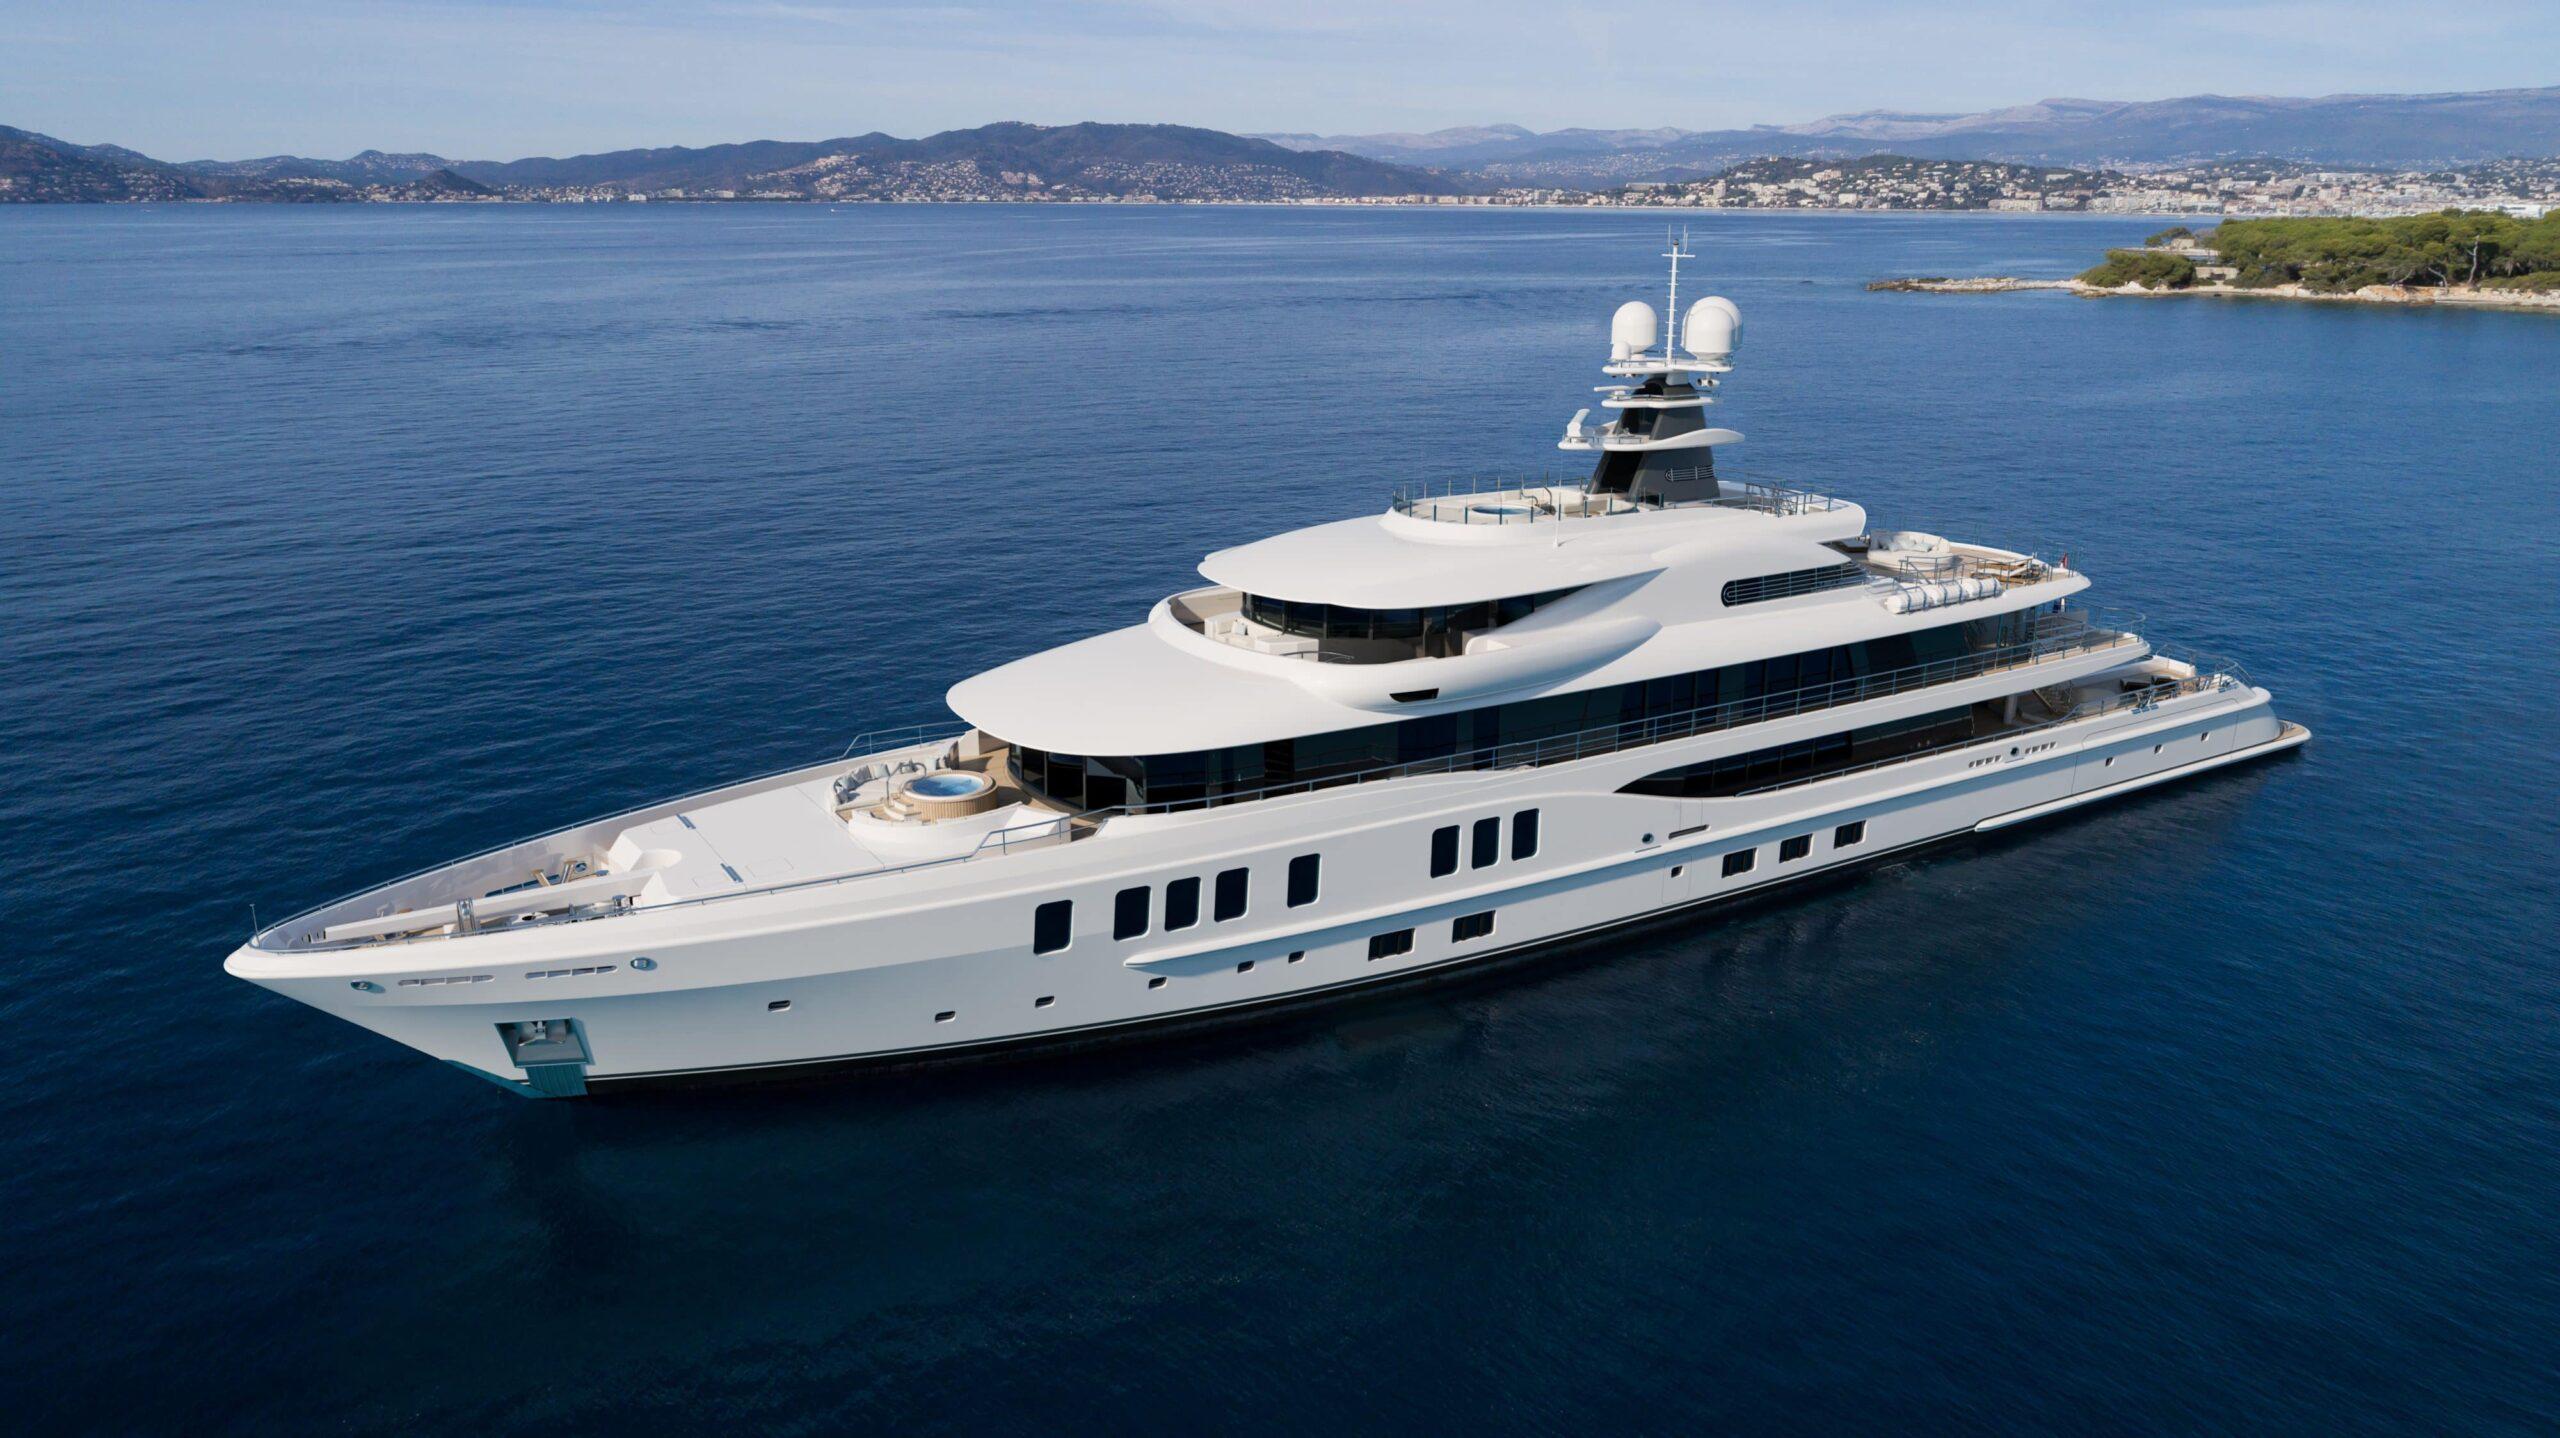 Heesen Yacht Prices